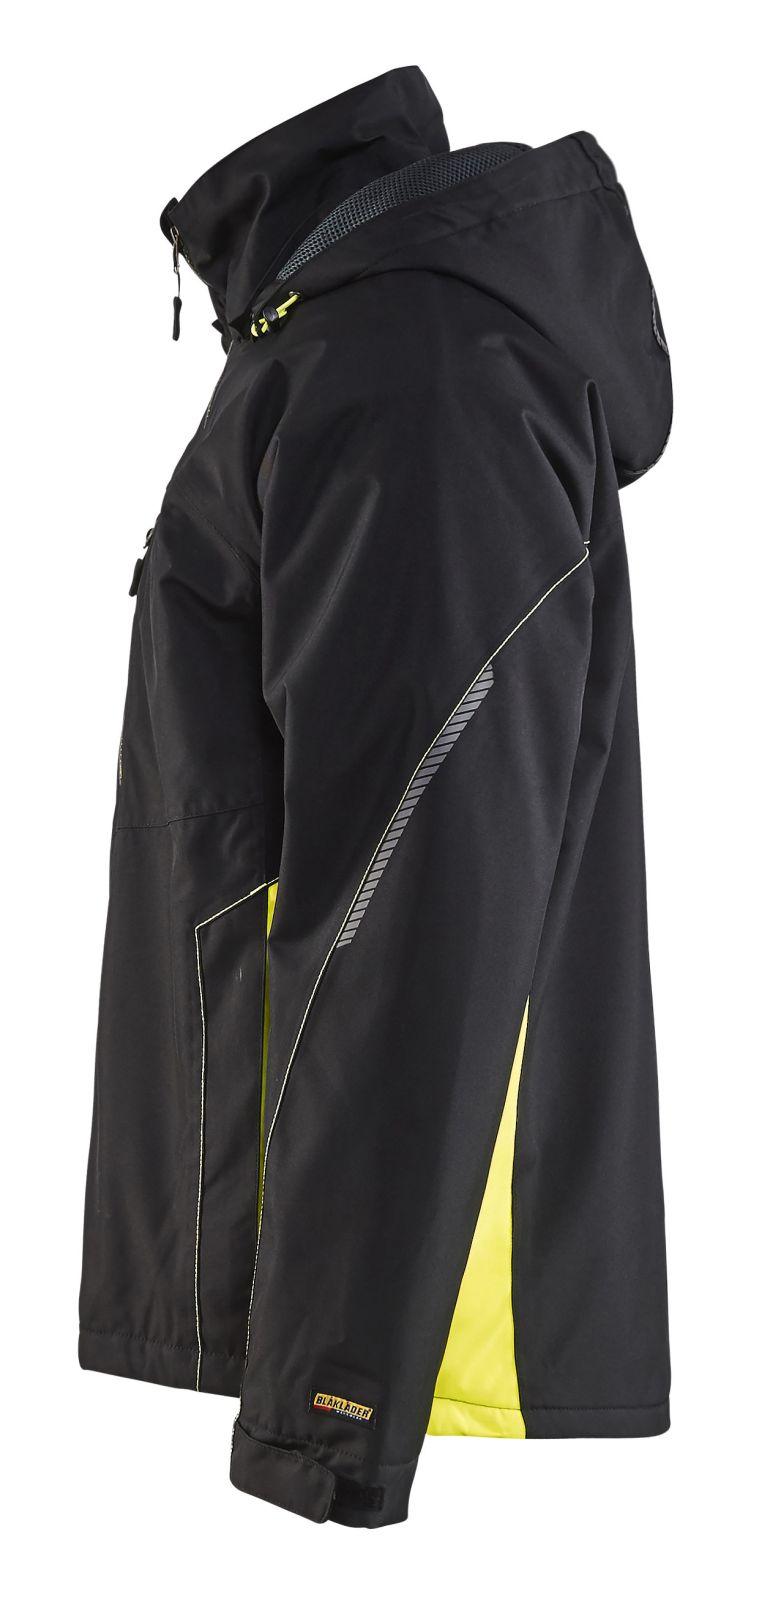 Blaklader Regenjacks 47901977 zwart-geel(9933)